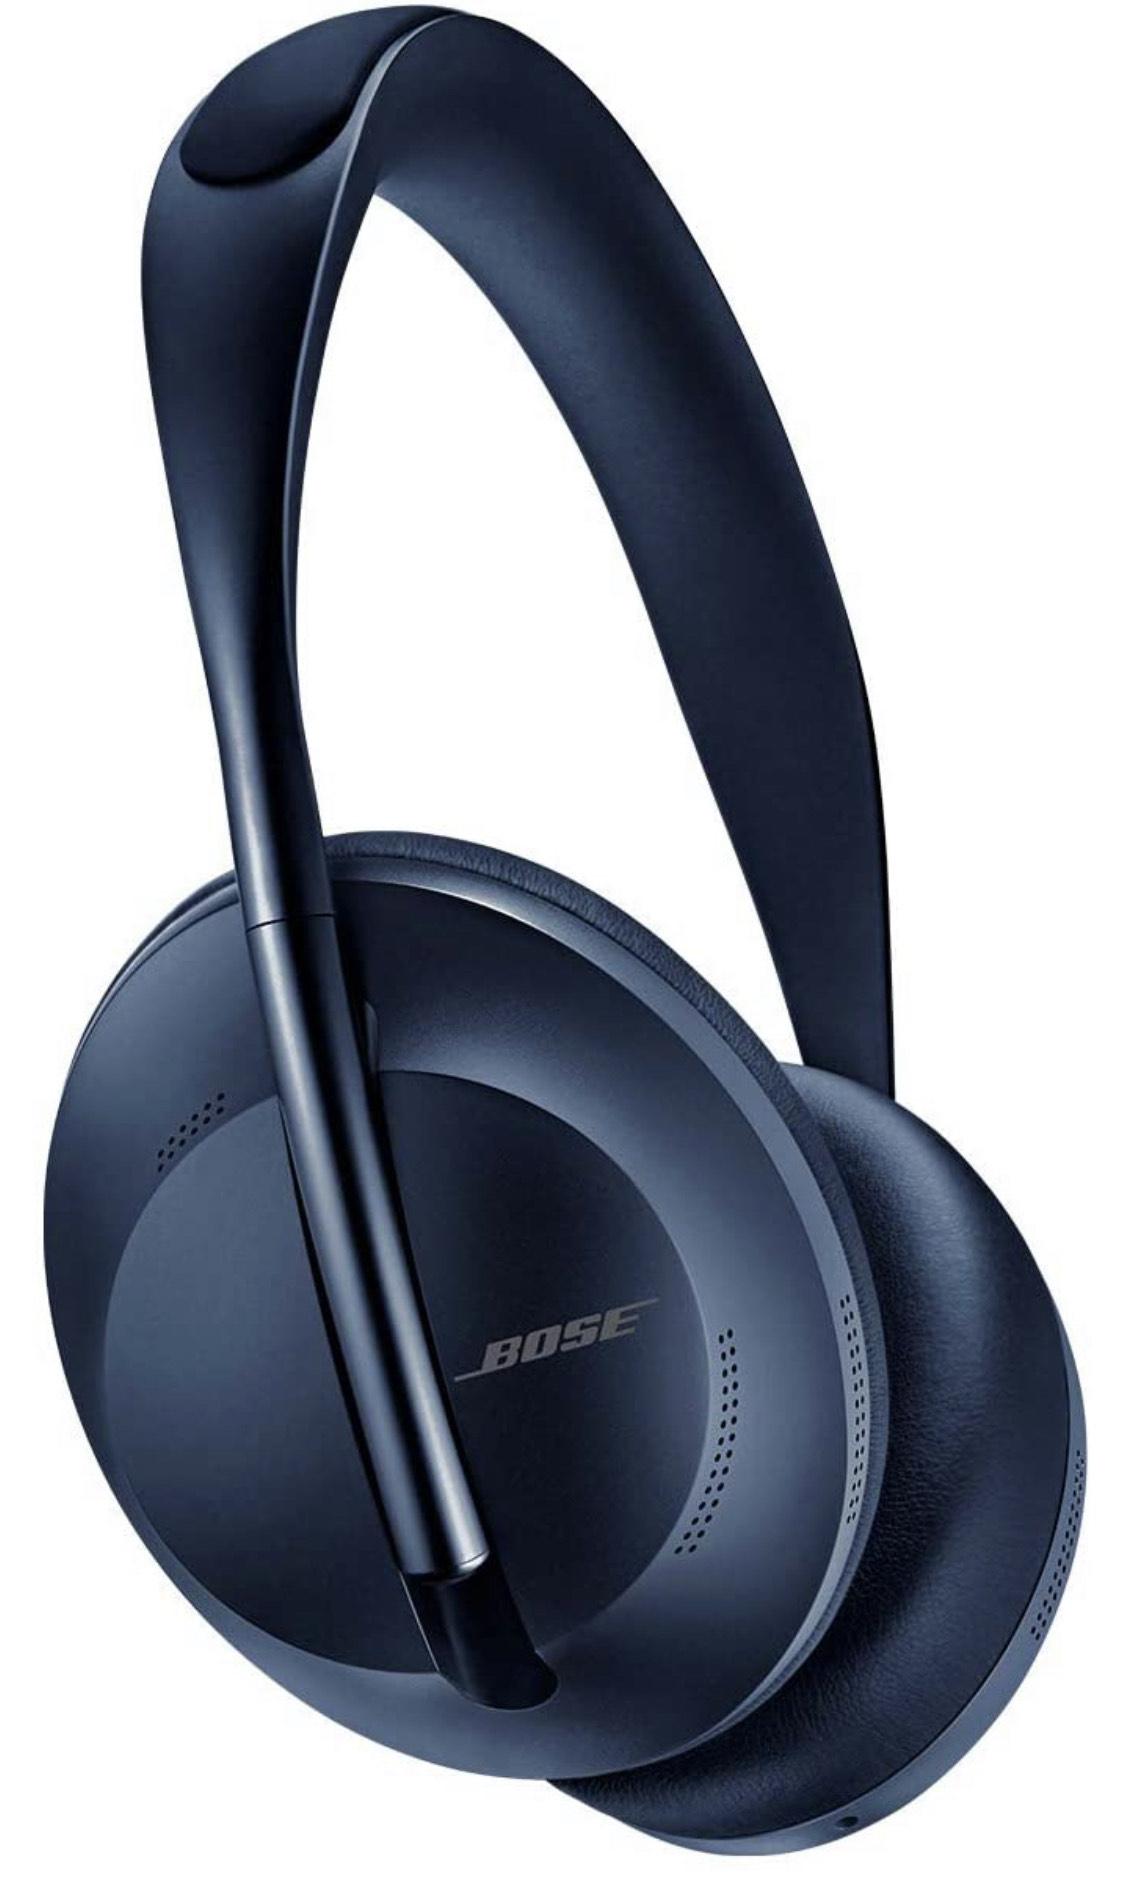 Bose Noise Cancelling Wireless Bluetooth Headphones 700 - £249 @ Amazon